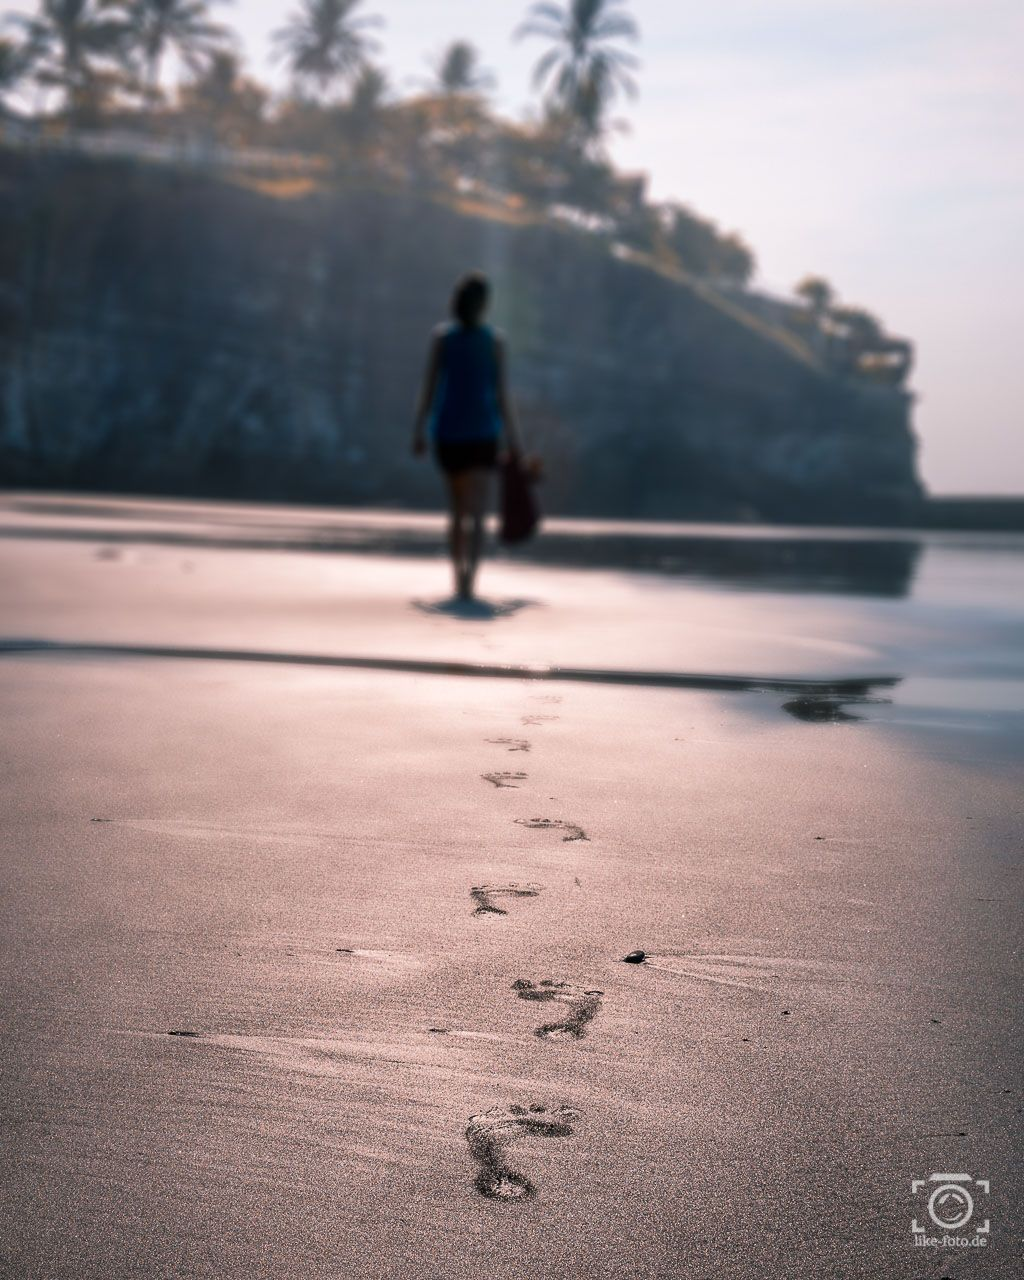 13 grandiose Ideen für kreative Strandfotos! – like-foto.de